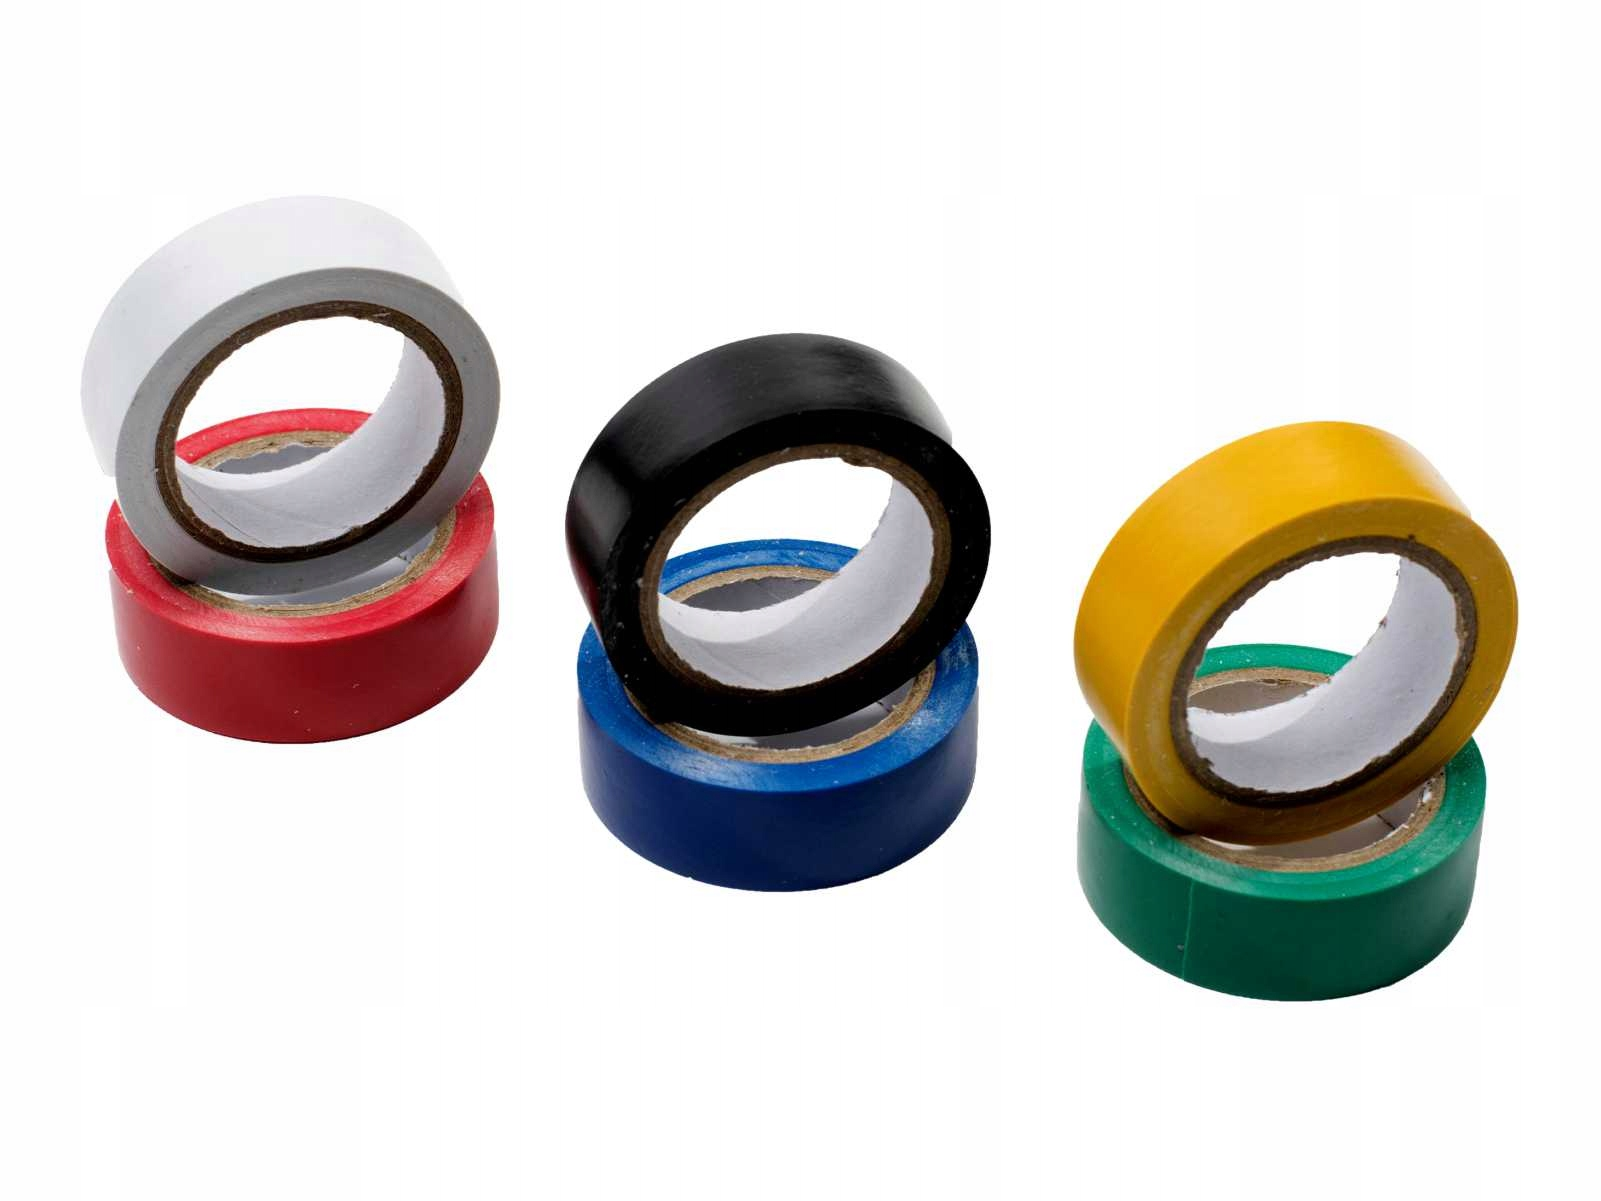 ПВХ изоляционные ленты цвета цвета 15mm 6 шт